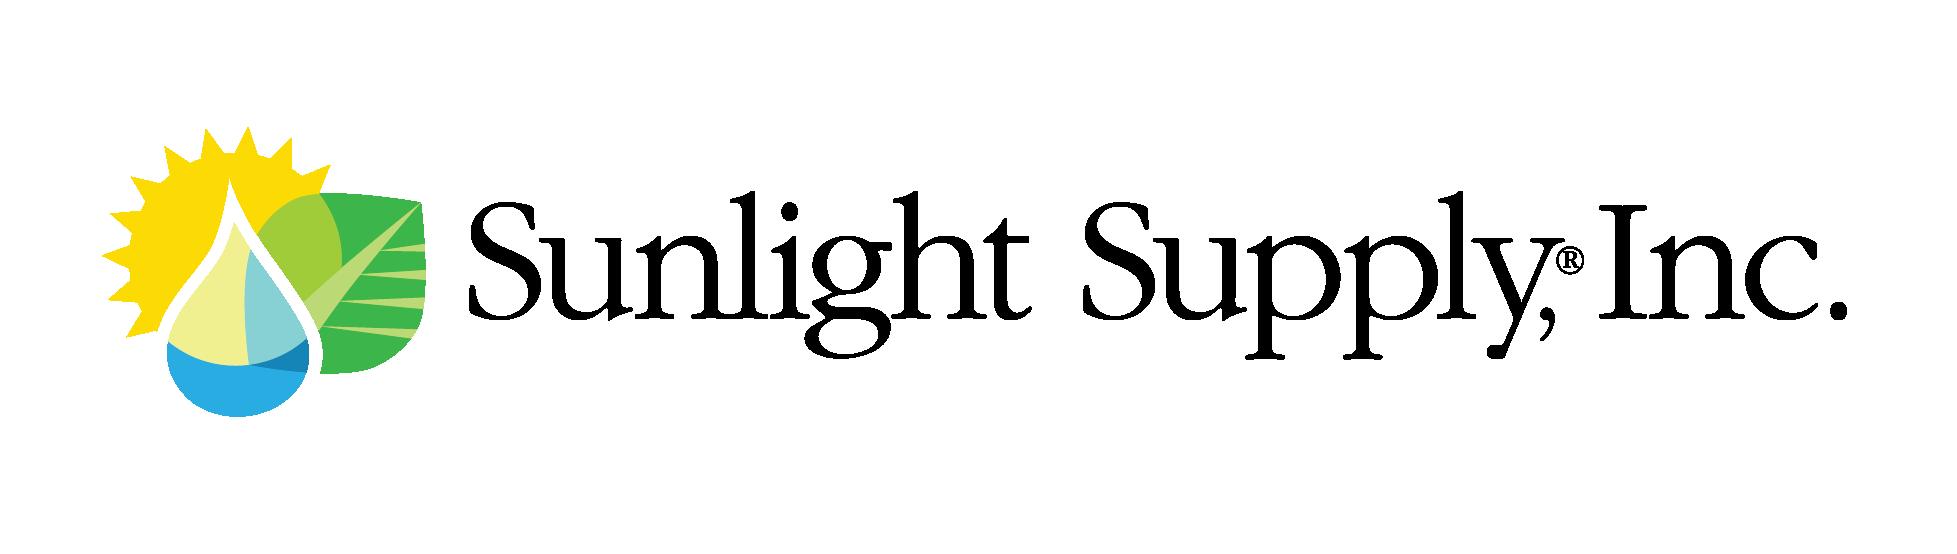 sls-logo-horizontal-blk.png